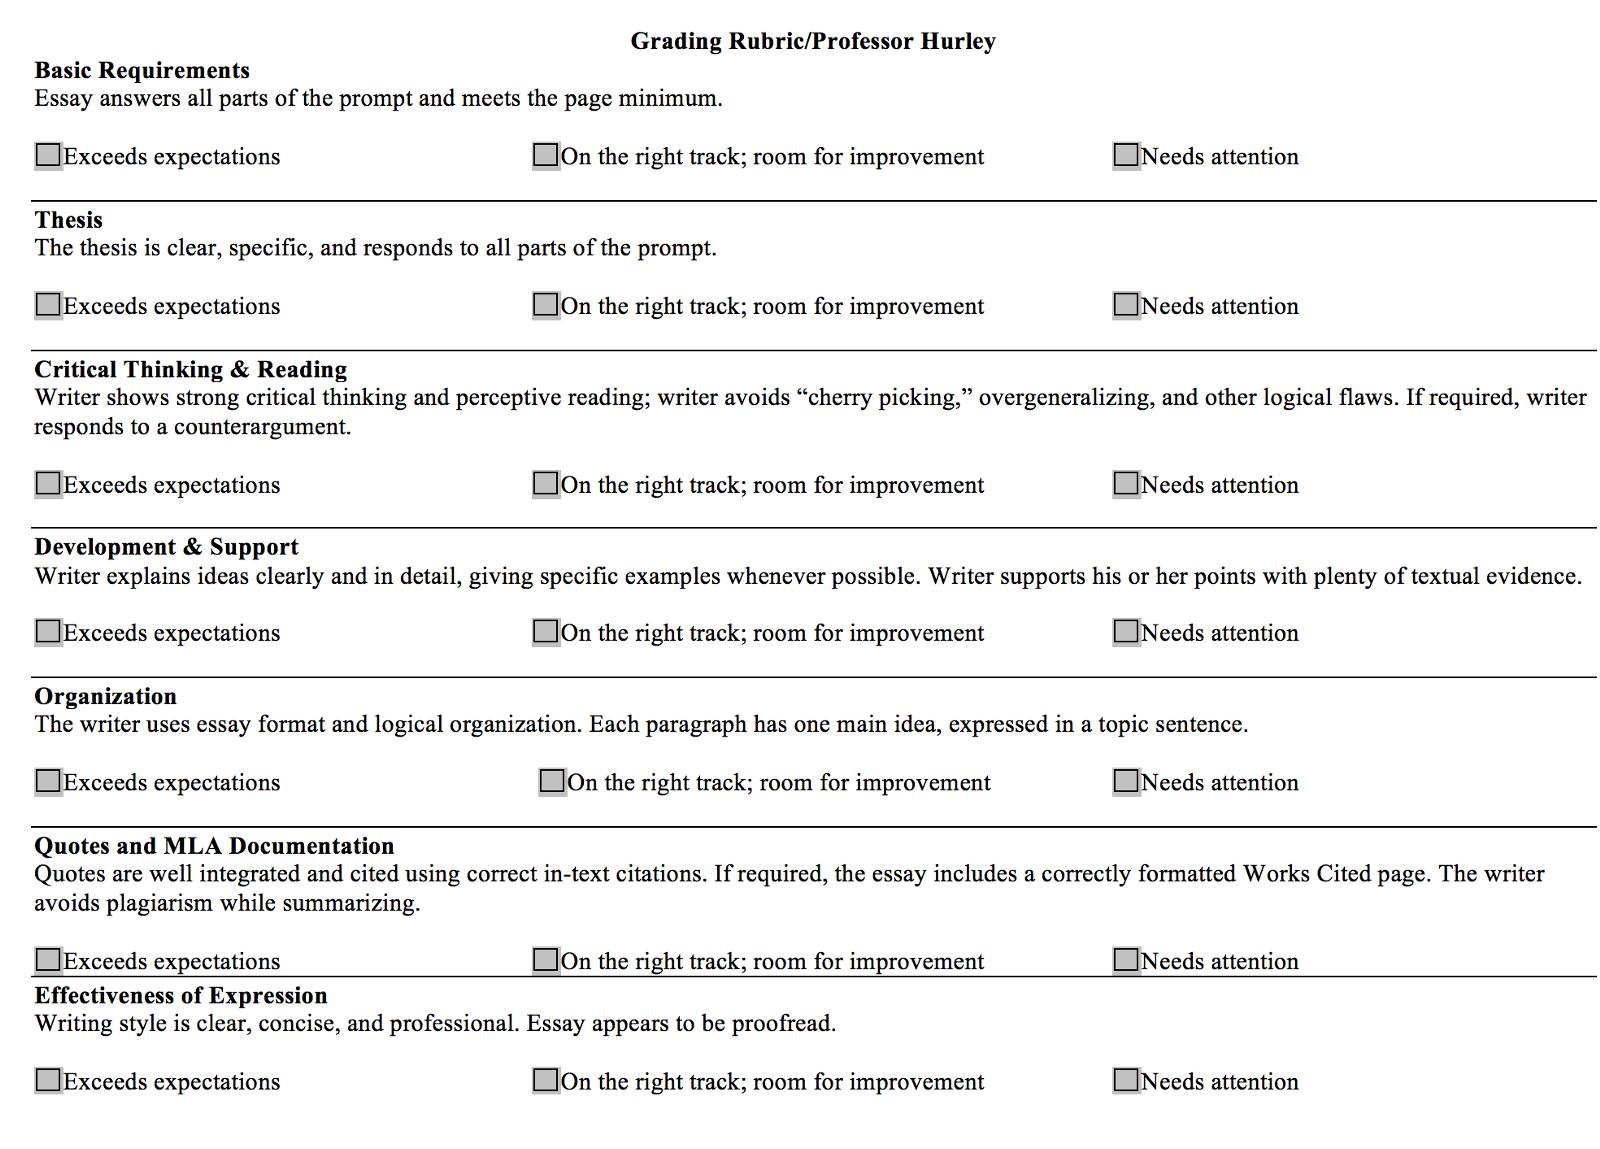 015 Rubrics In Essay Writing Example 1l7bkjqmu2kth Pcoqy7bgg Formidable Holistic For Pdf Rubric Middle School Full